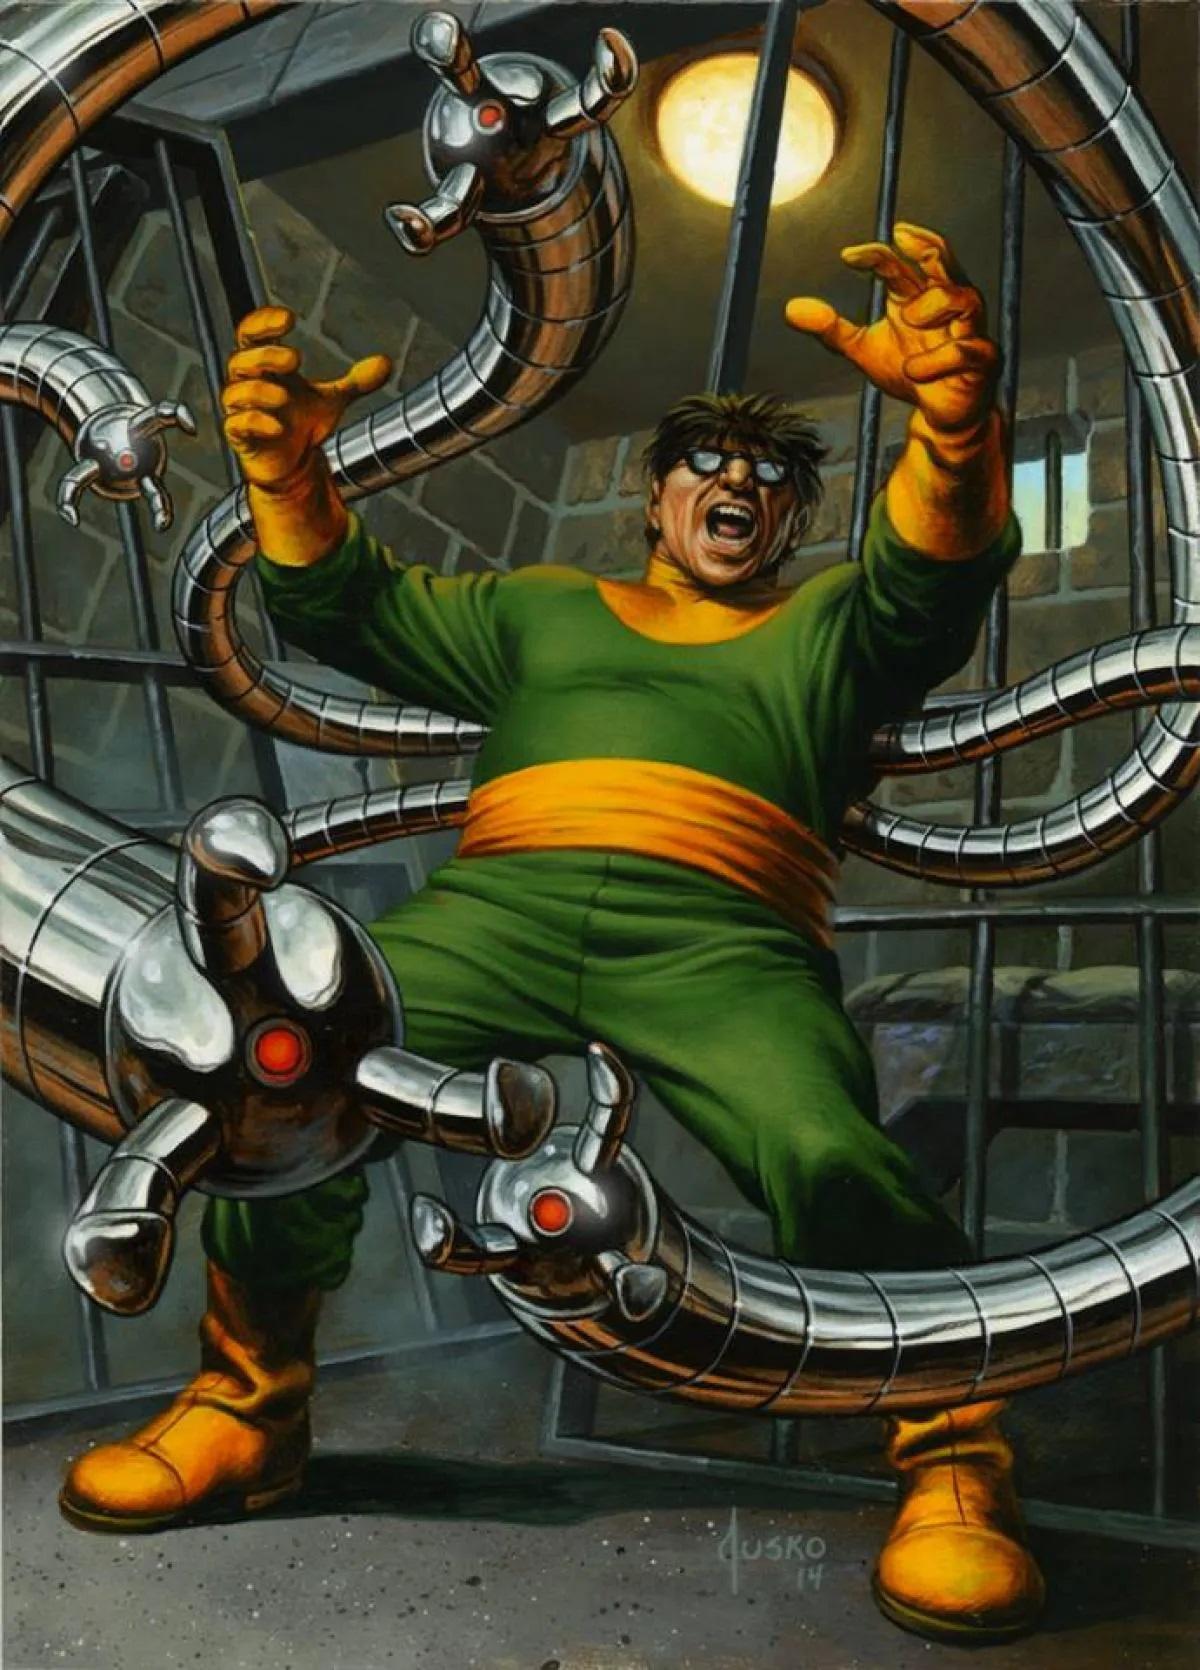 Doctor Octopus | Villains Wiki | FANDOM powered by Wikia